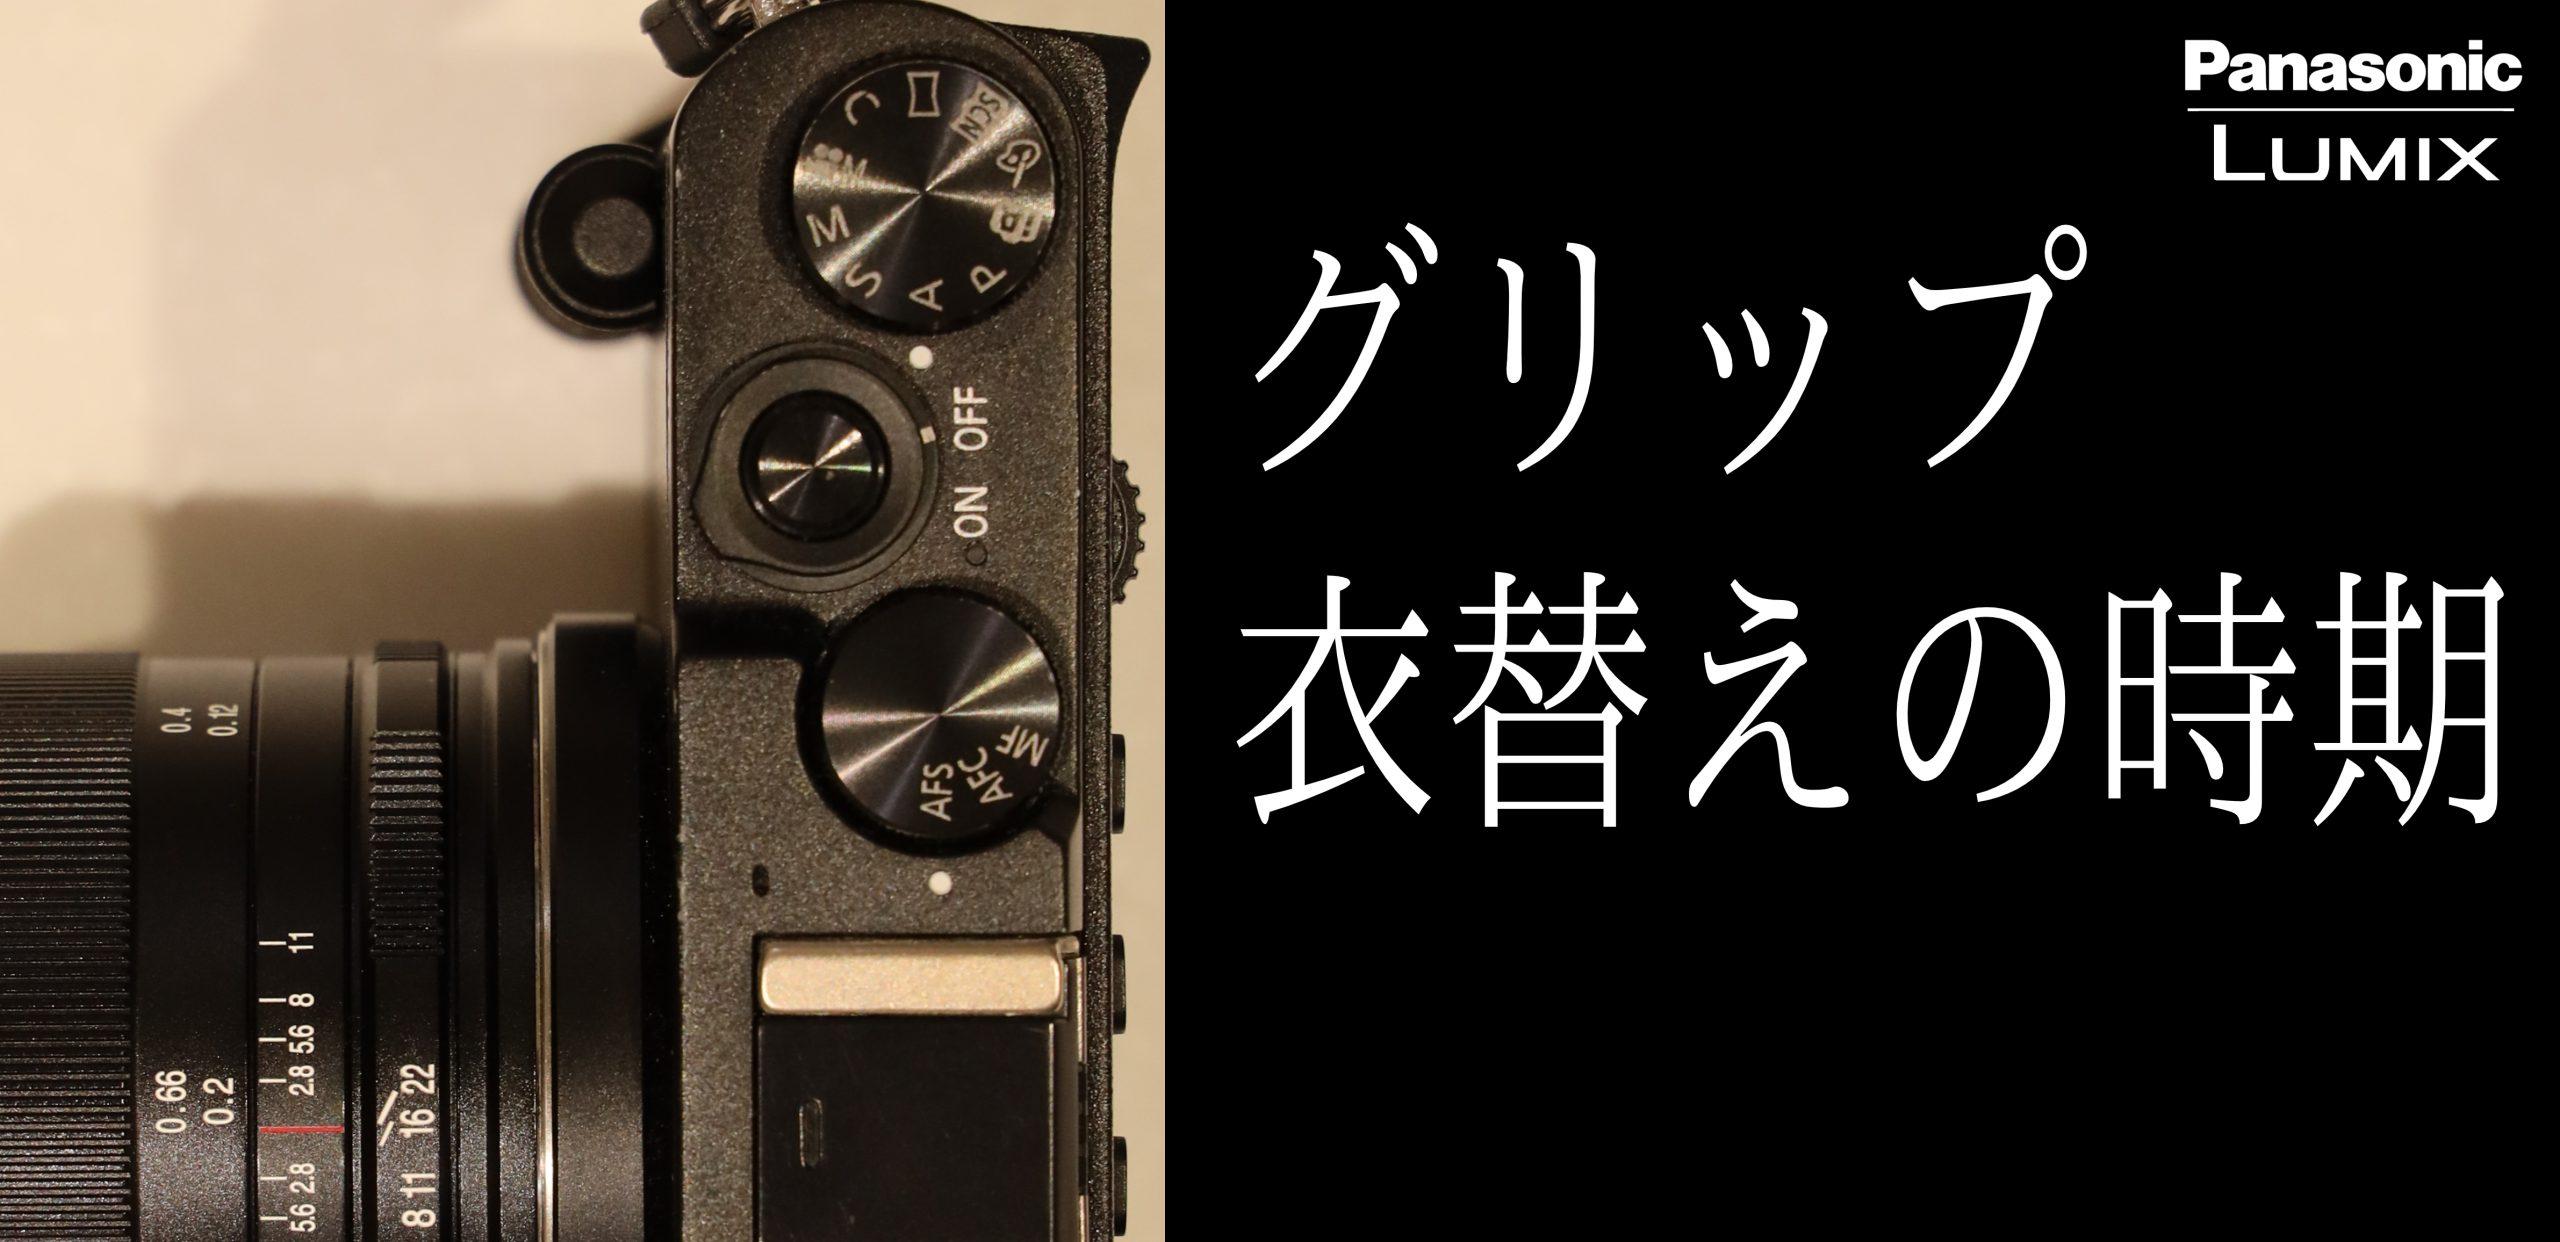 【Panasonic】グリップ衣替えの時期